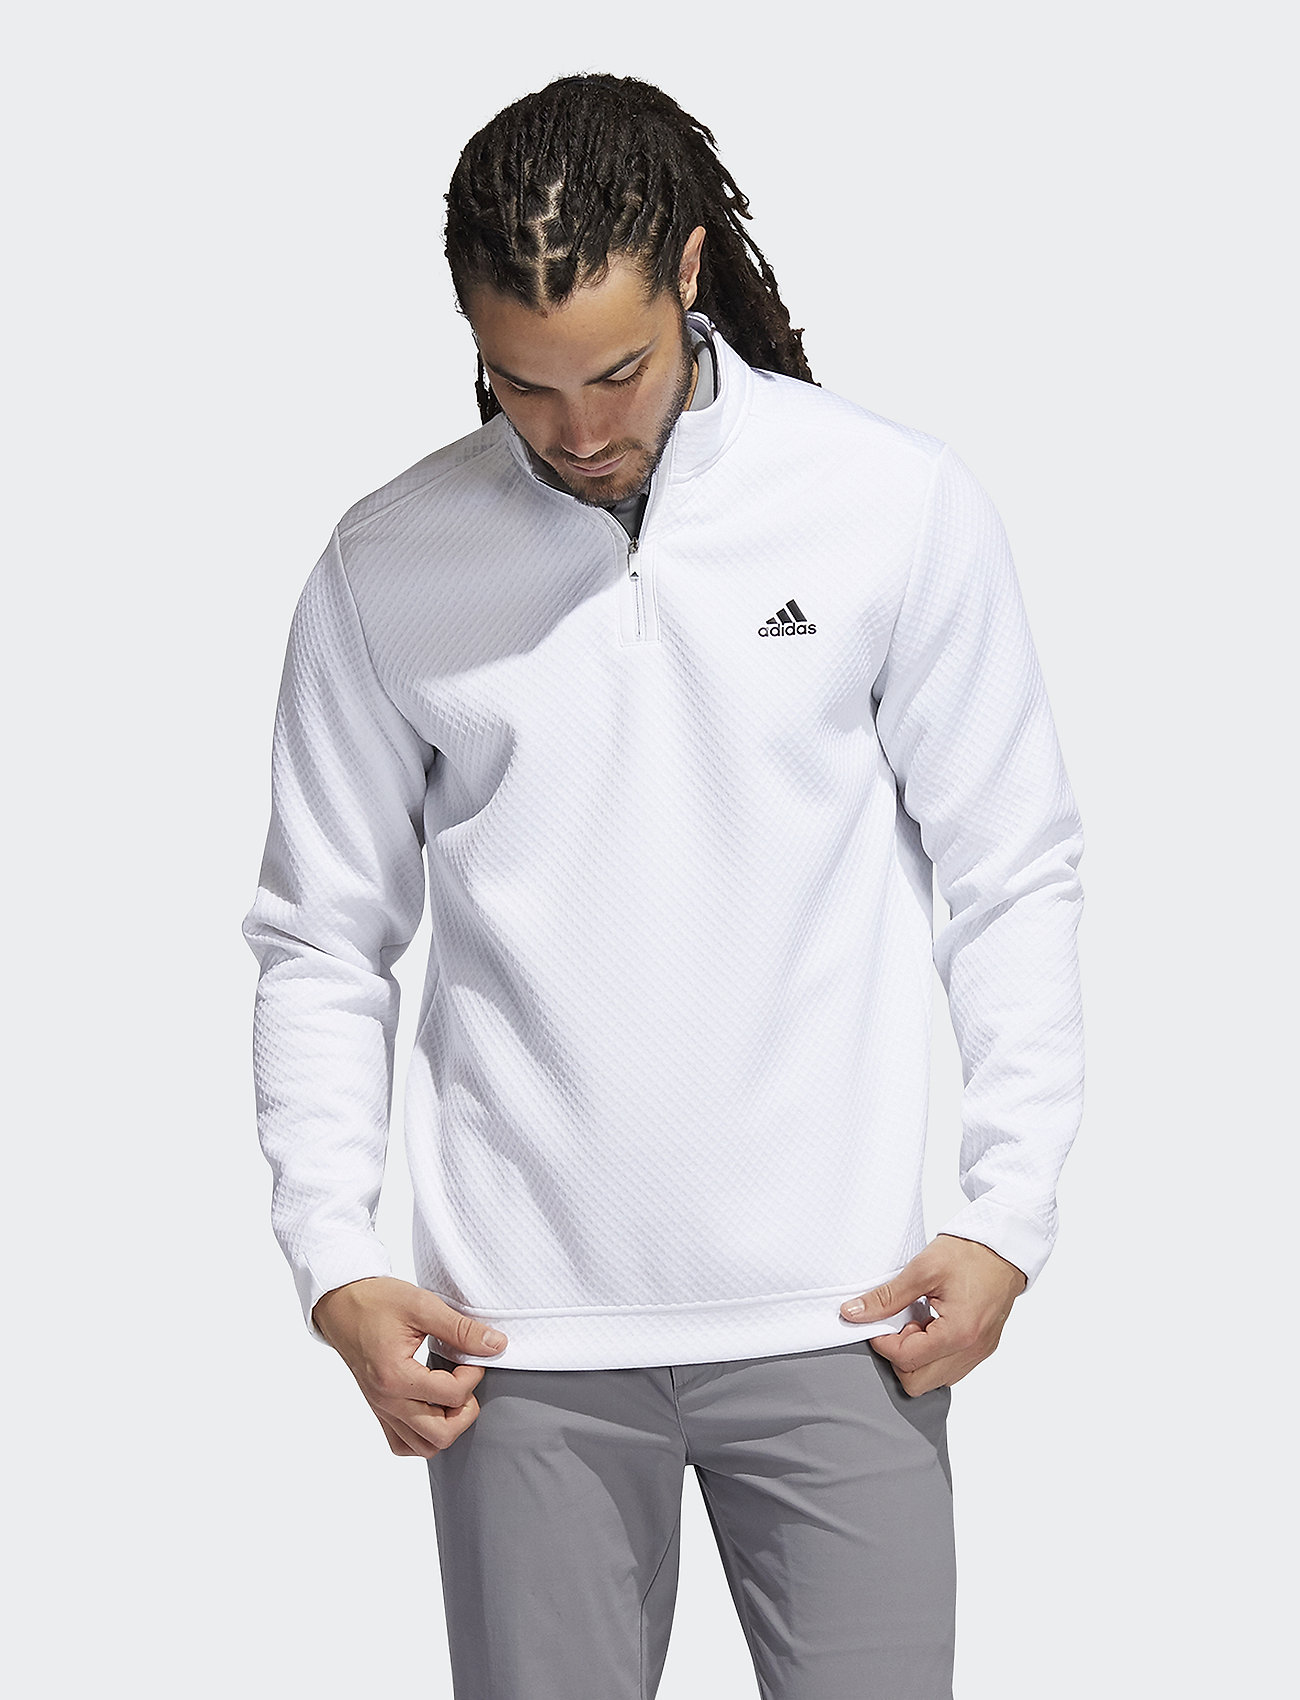 adidas Golf - DWR 1/4 ZIP - sweats - white - 0